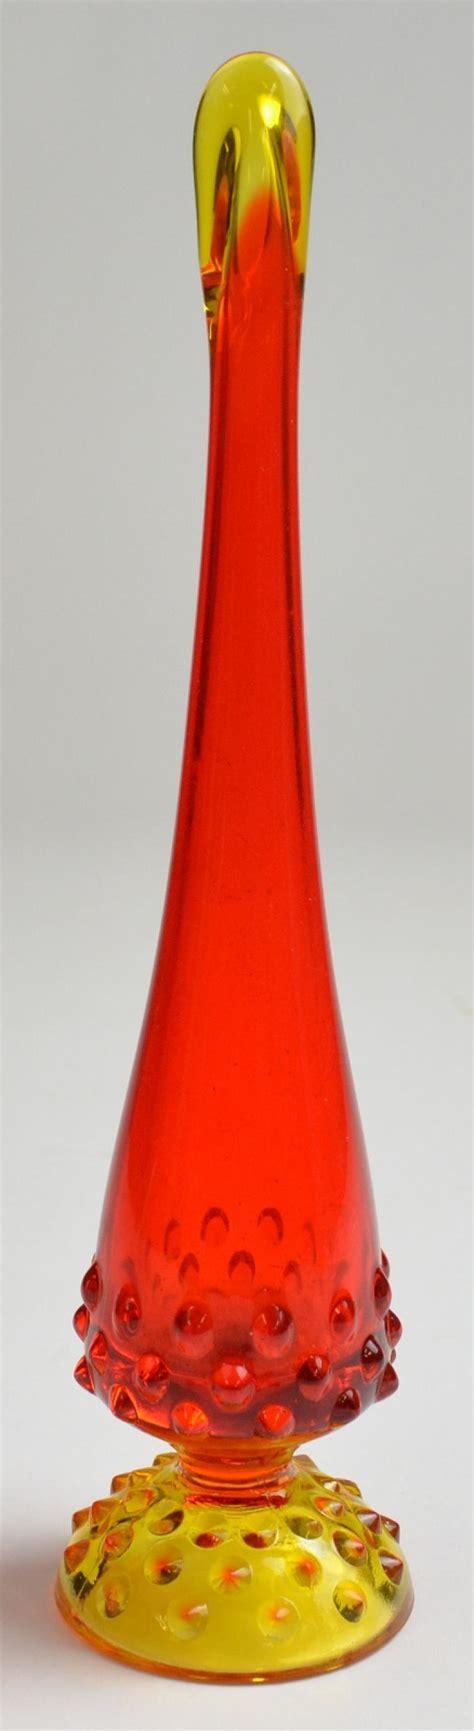 Swung Glass Vase Fenton Art Glass Swung Bud Vase Hobnail Amberina Orange